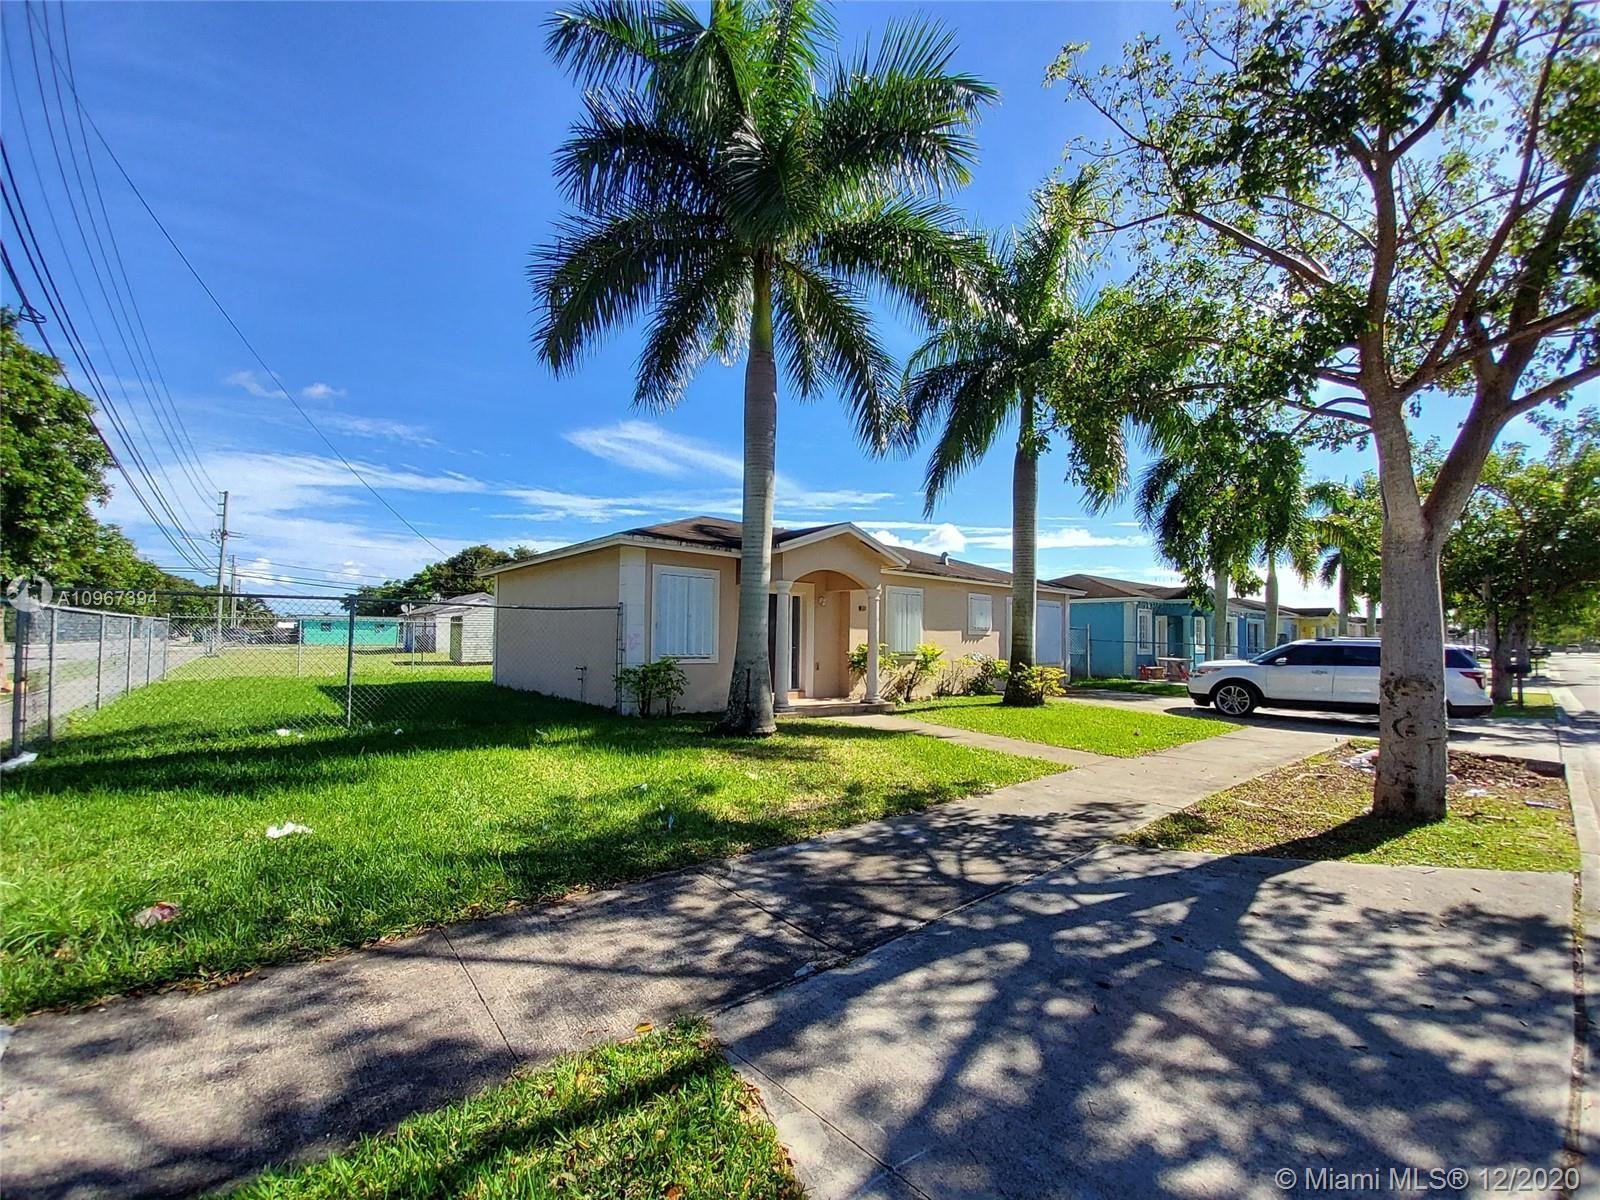 1370 NW 9th Ct, Florida City, FL 33034 - #: A10967394